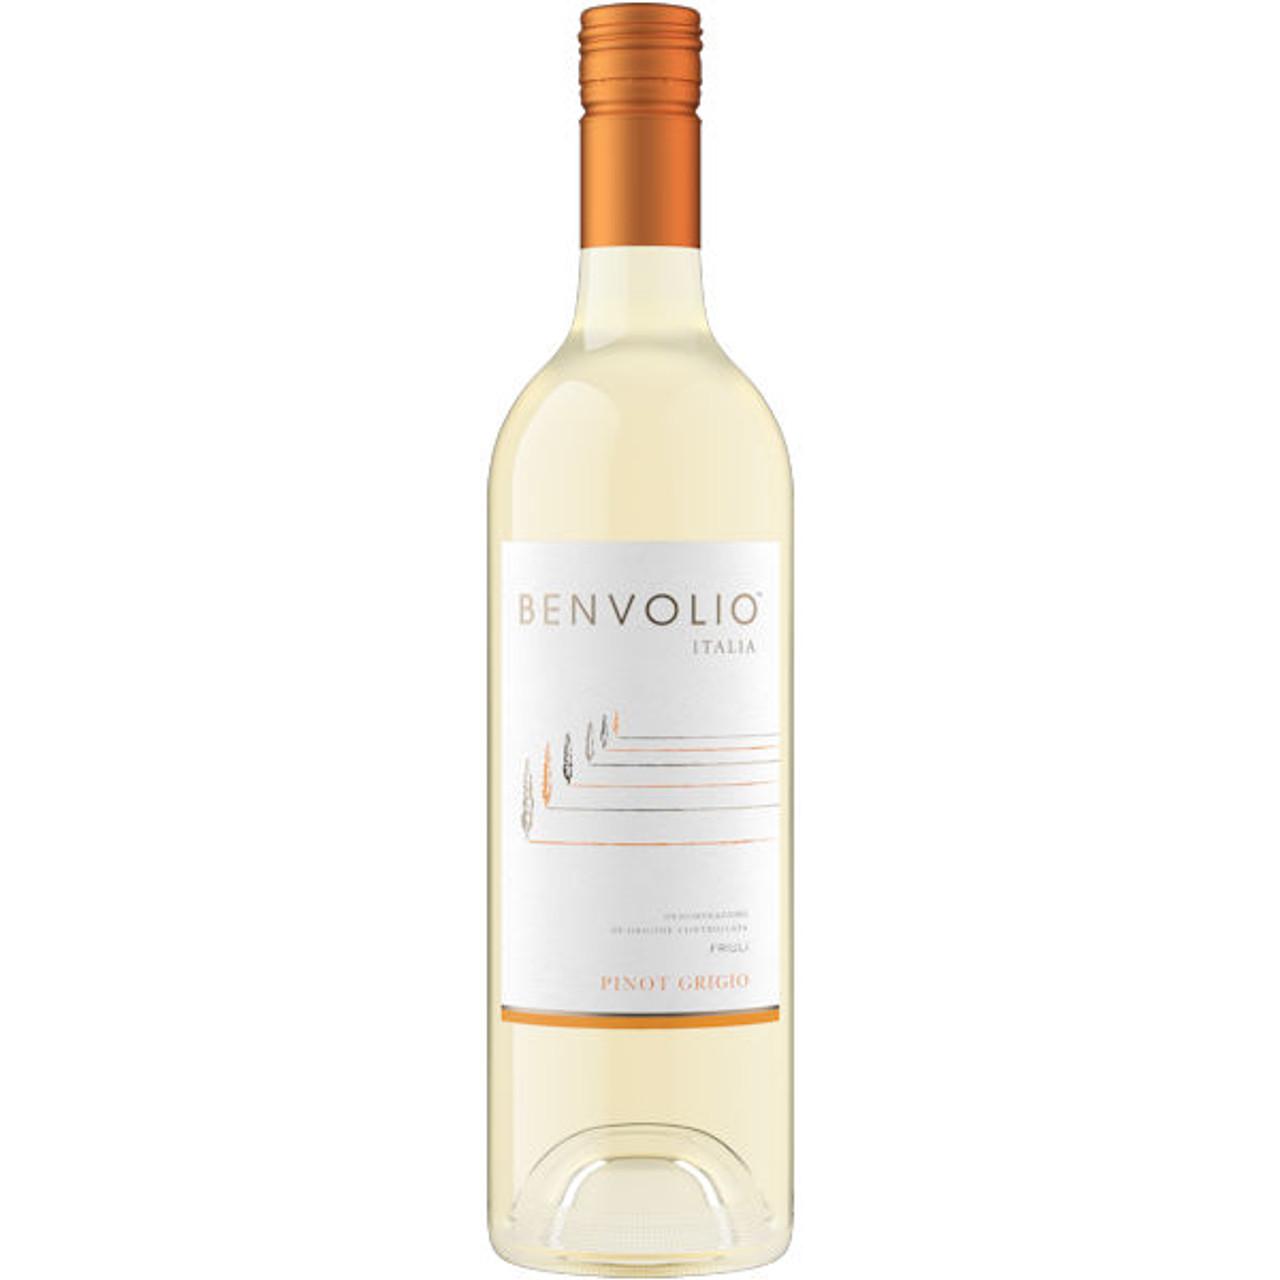 Benvolio Pinot Grigio Friuli DOC